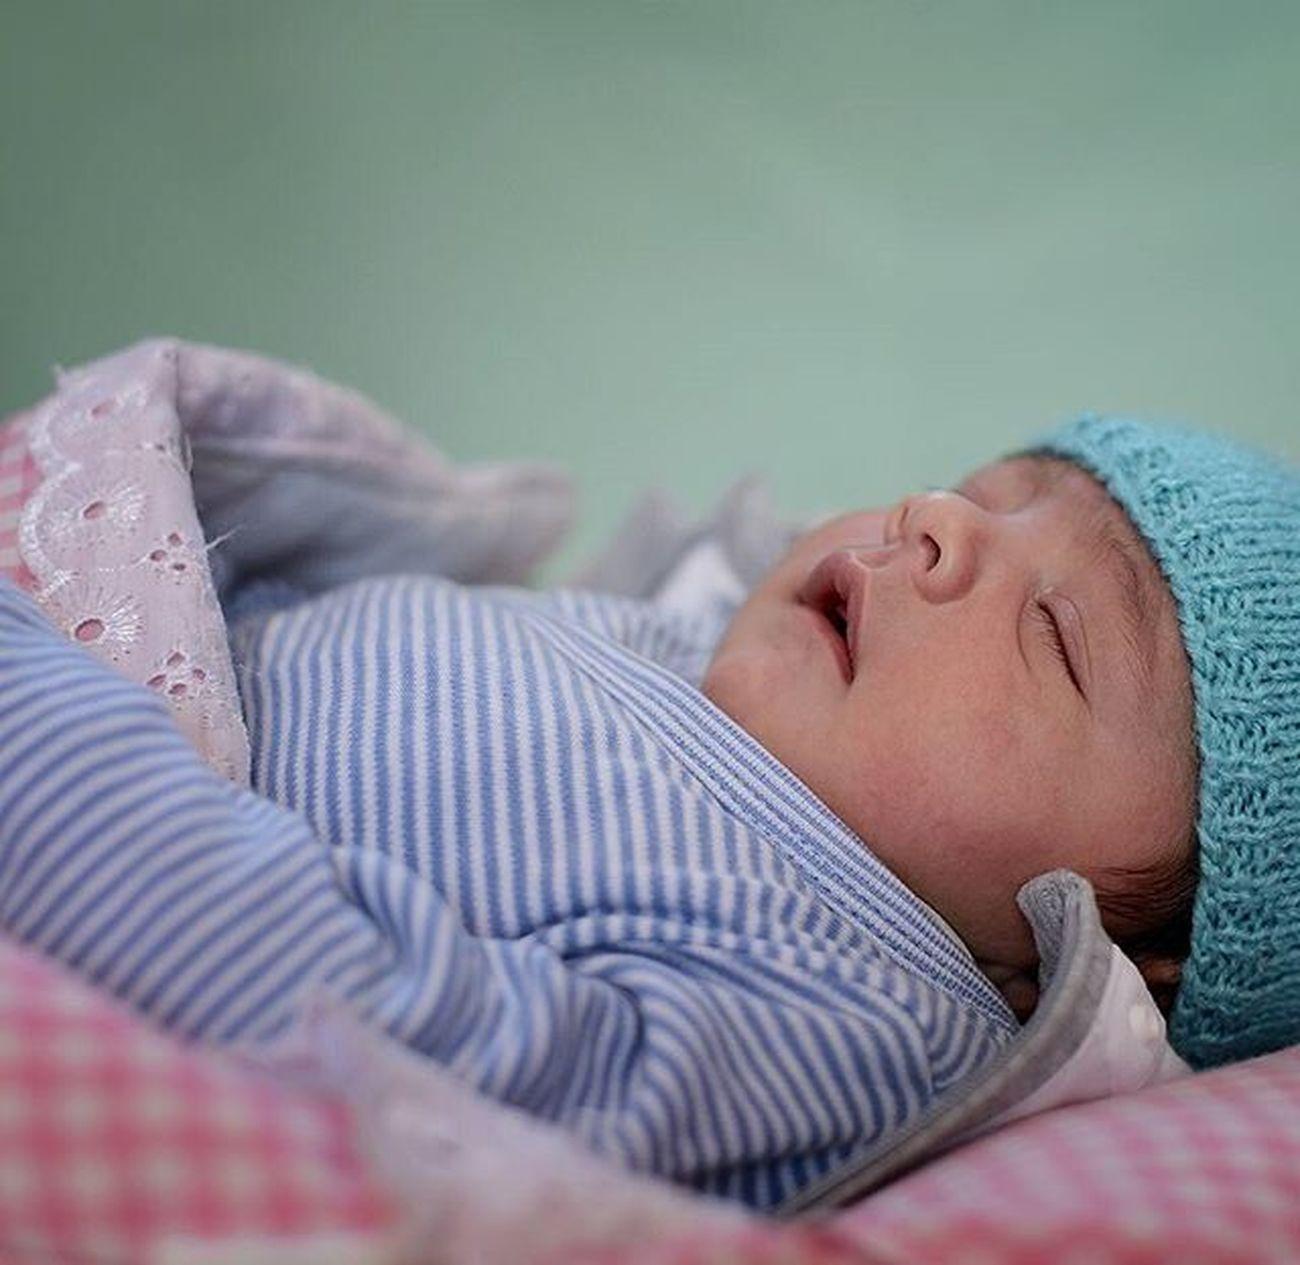 Congratulations to Tarun Bhaiya and Tripta for Beautiful Baby Girl 😊😊😊 NewlyBorn Newbornbaby Baby Cute Babygirl NikonD800 India